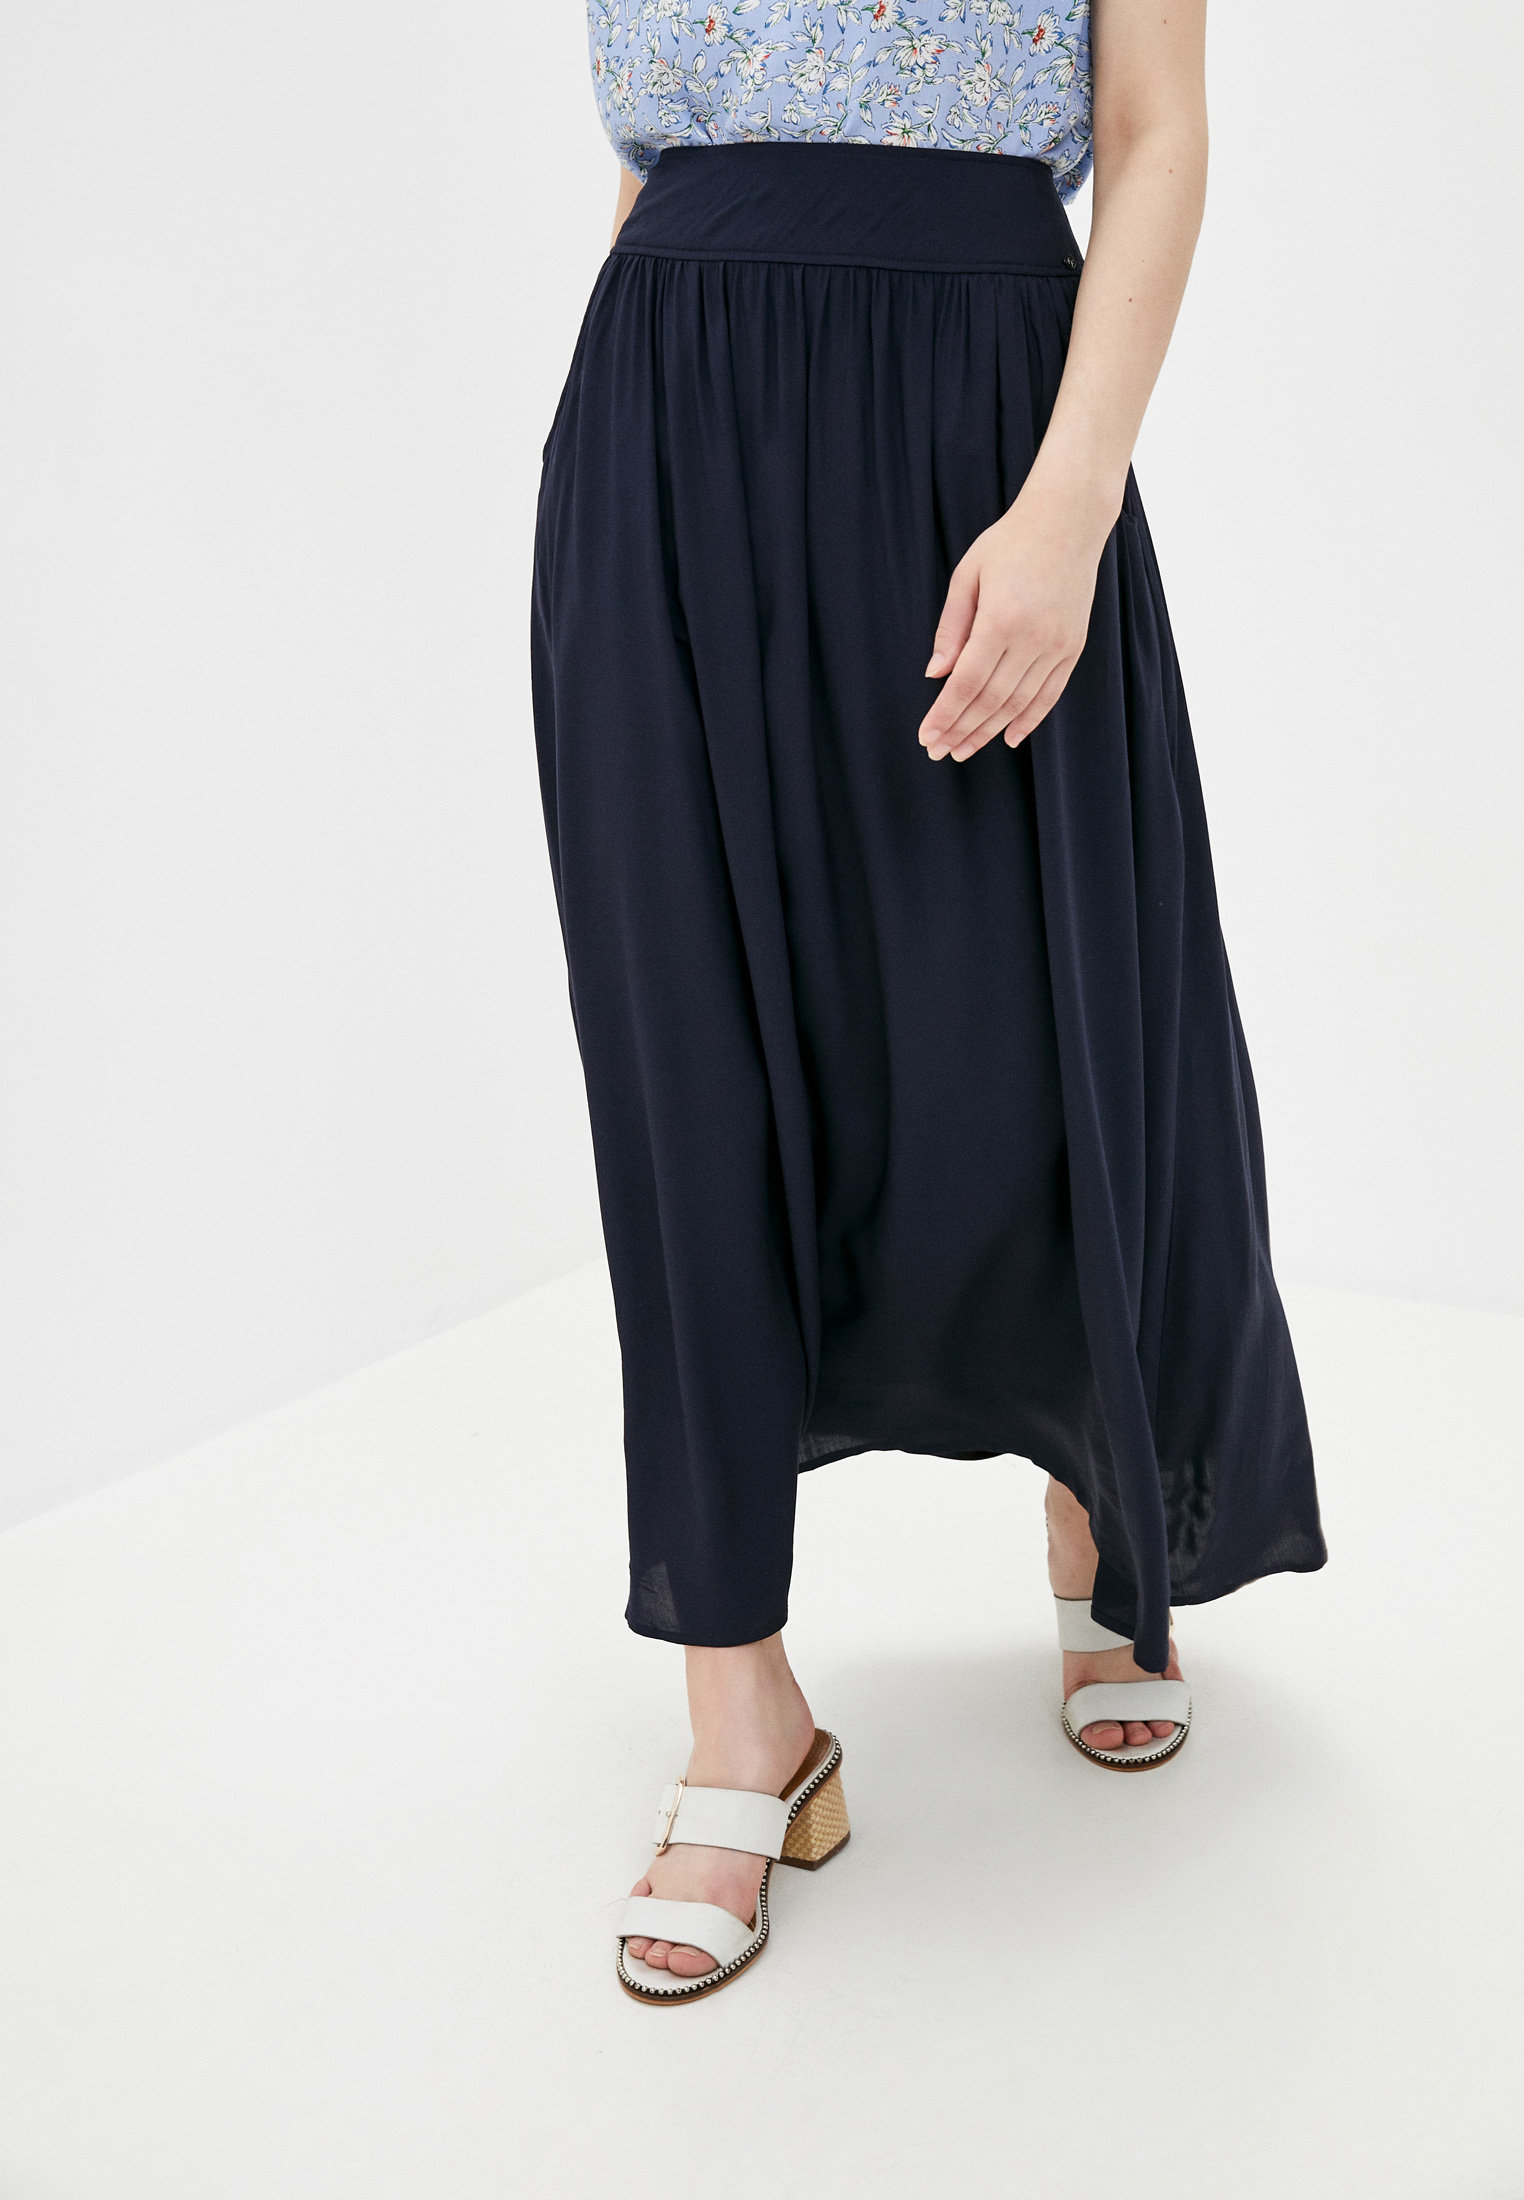 Широкая юбка Finn Flare (Фин Флаер) S19-140101